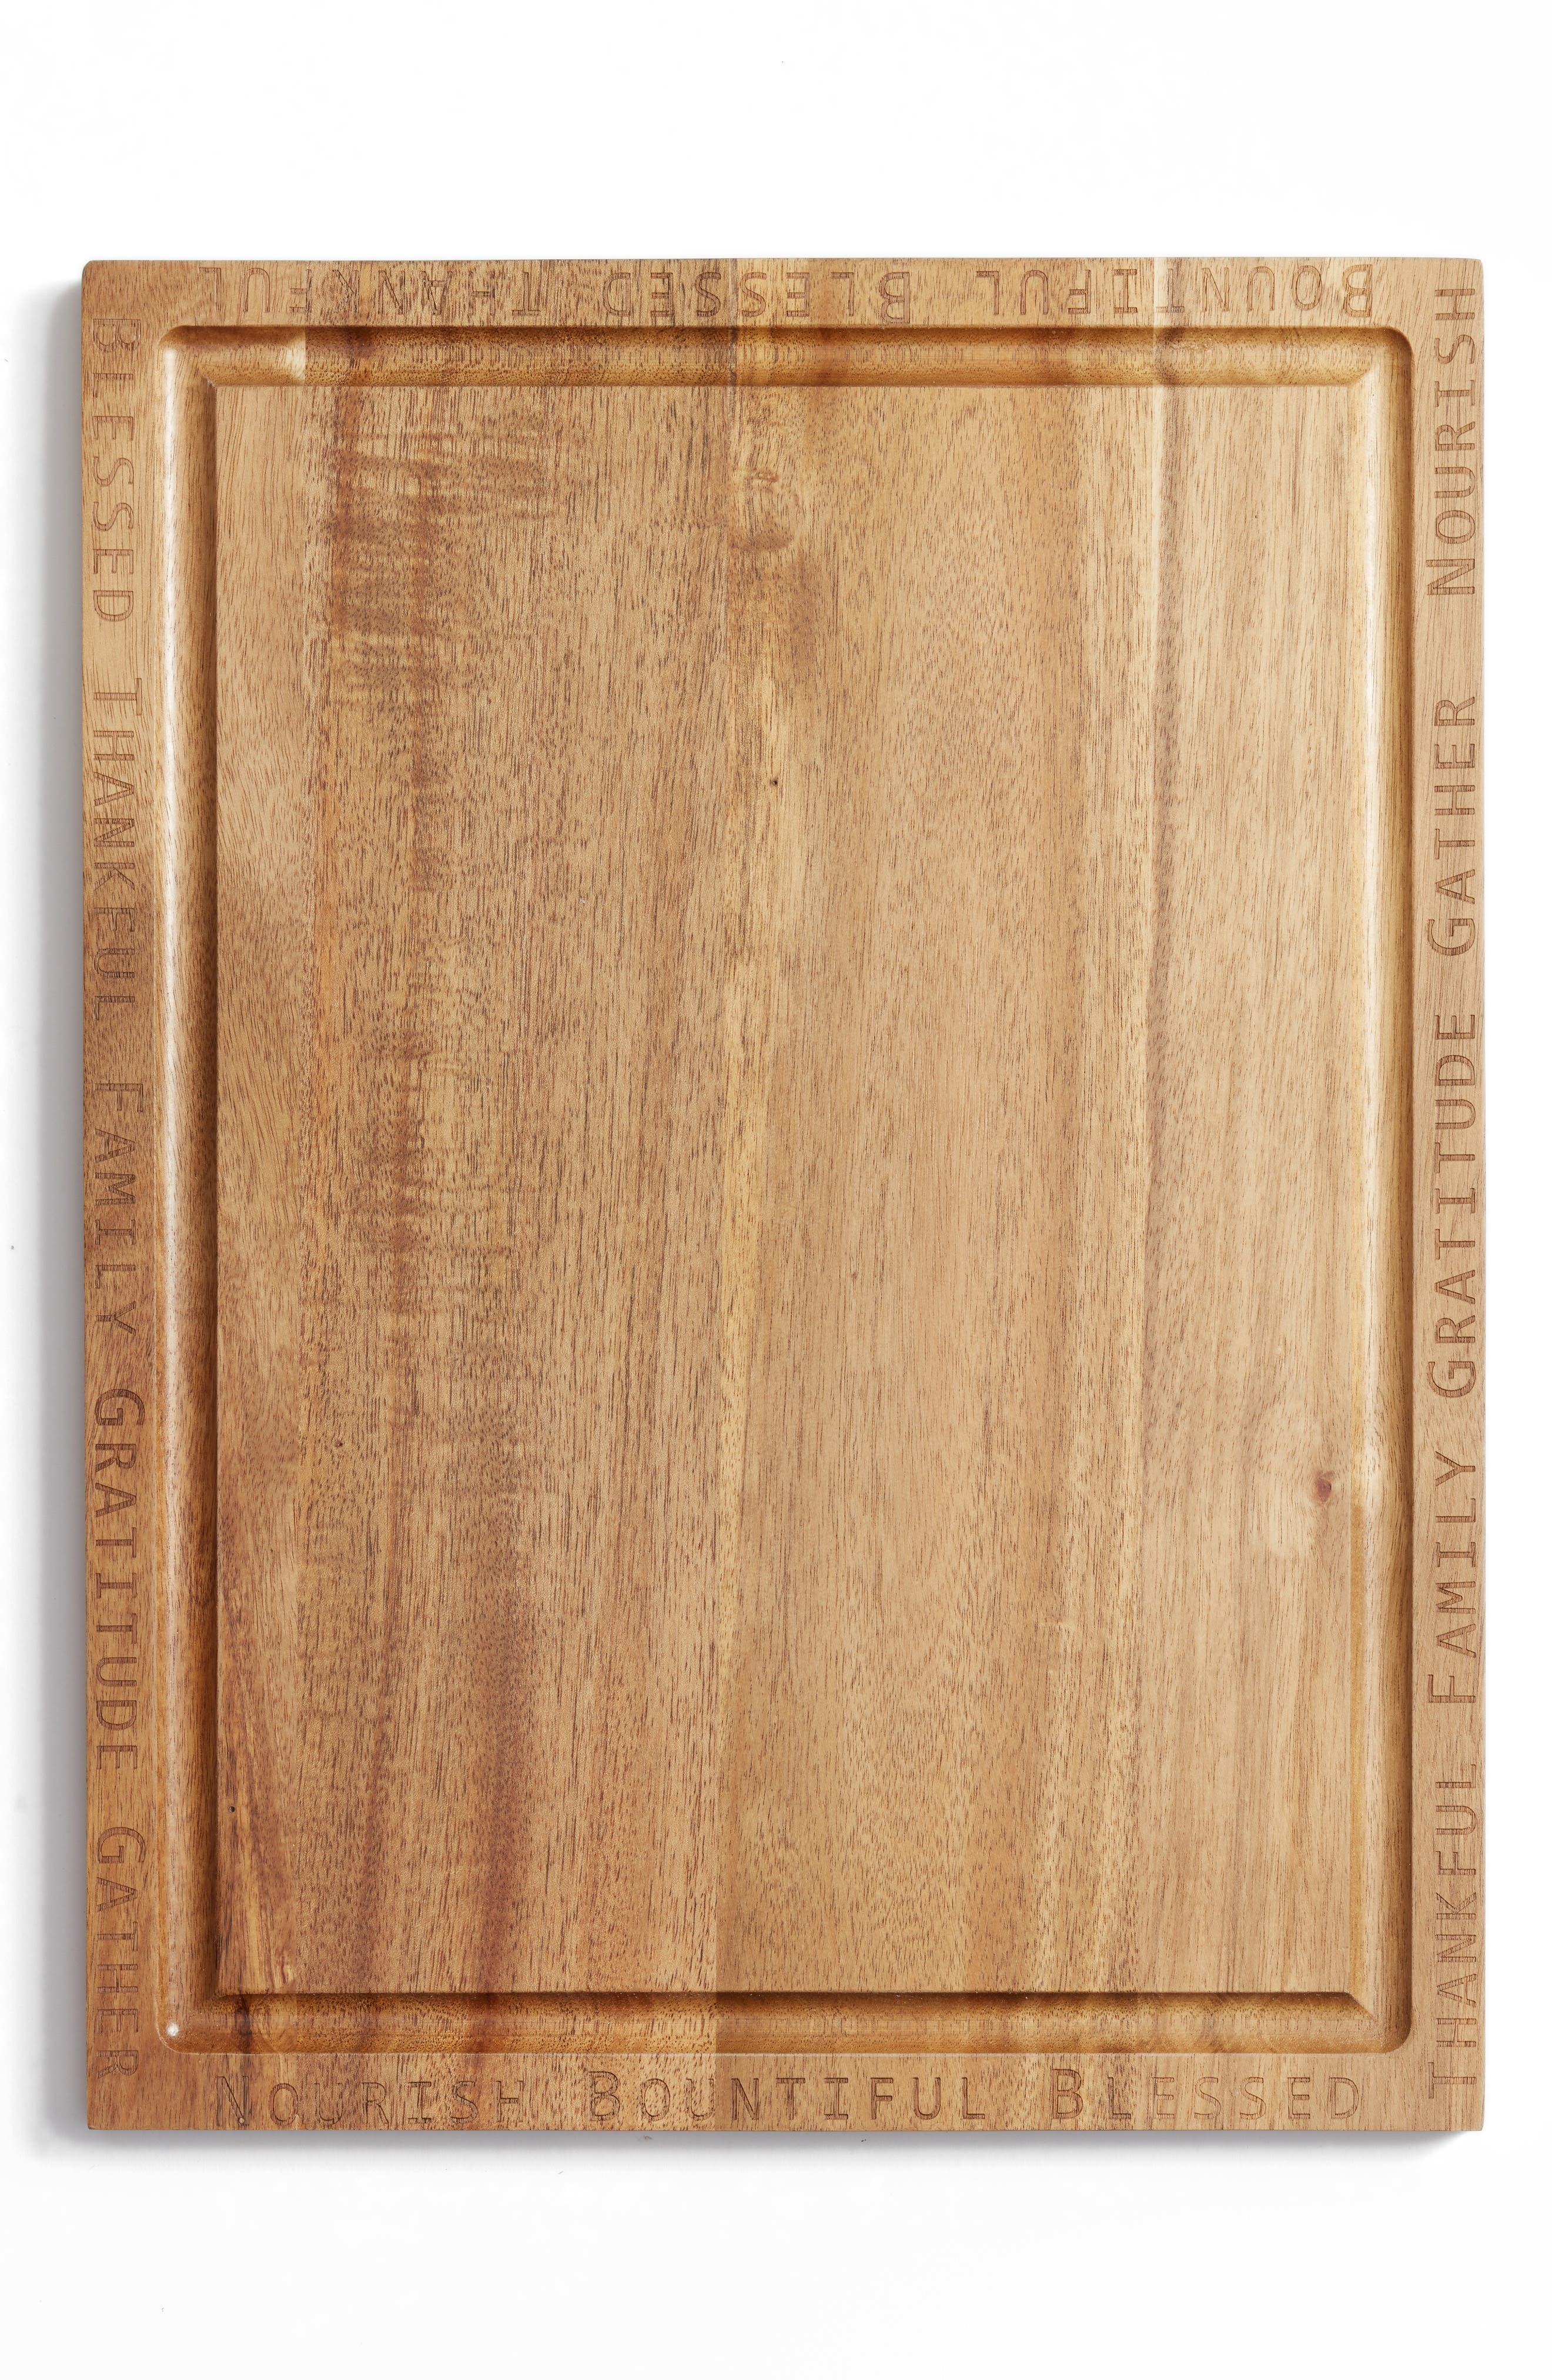 Nordstrom at Home Acacia Wood Cutting Board